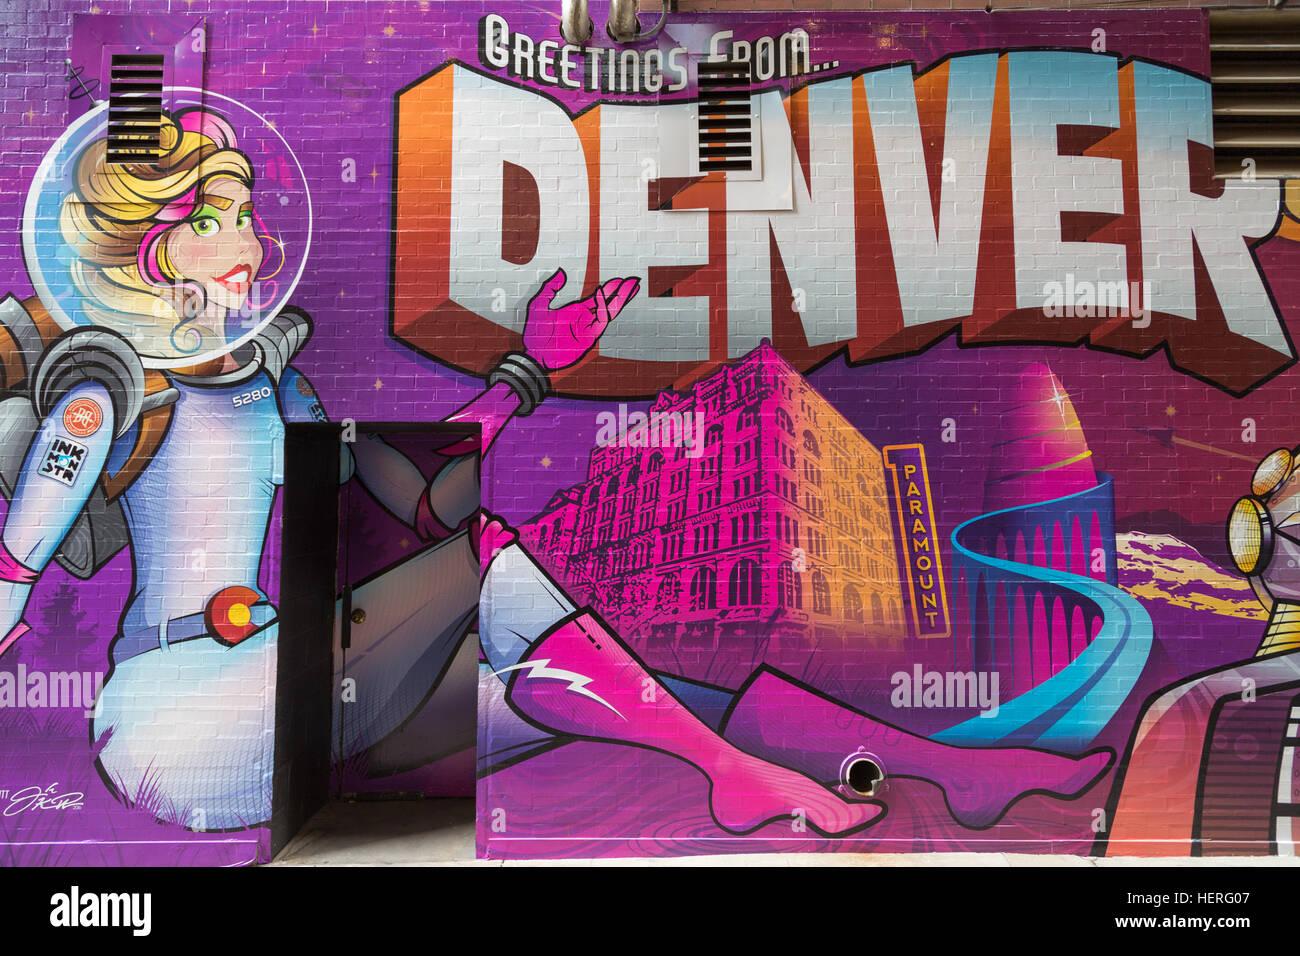 Graffiti, Lower Downtown, Denver, Colorado, USA - Stock Image